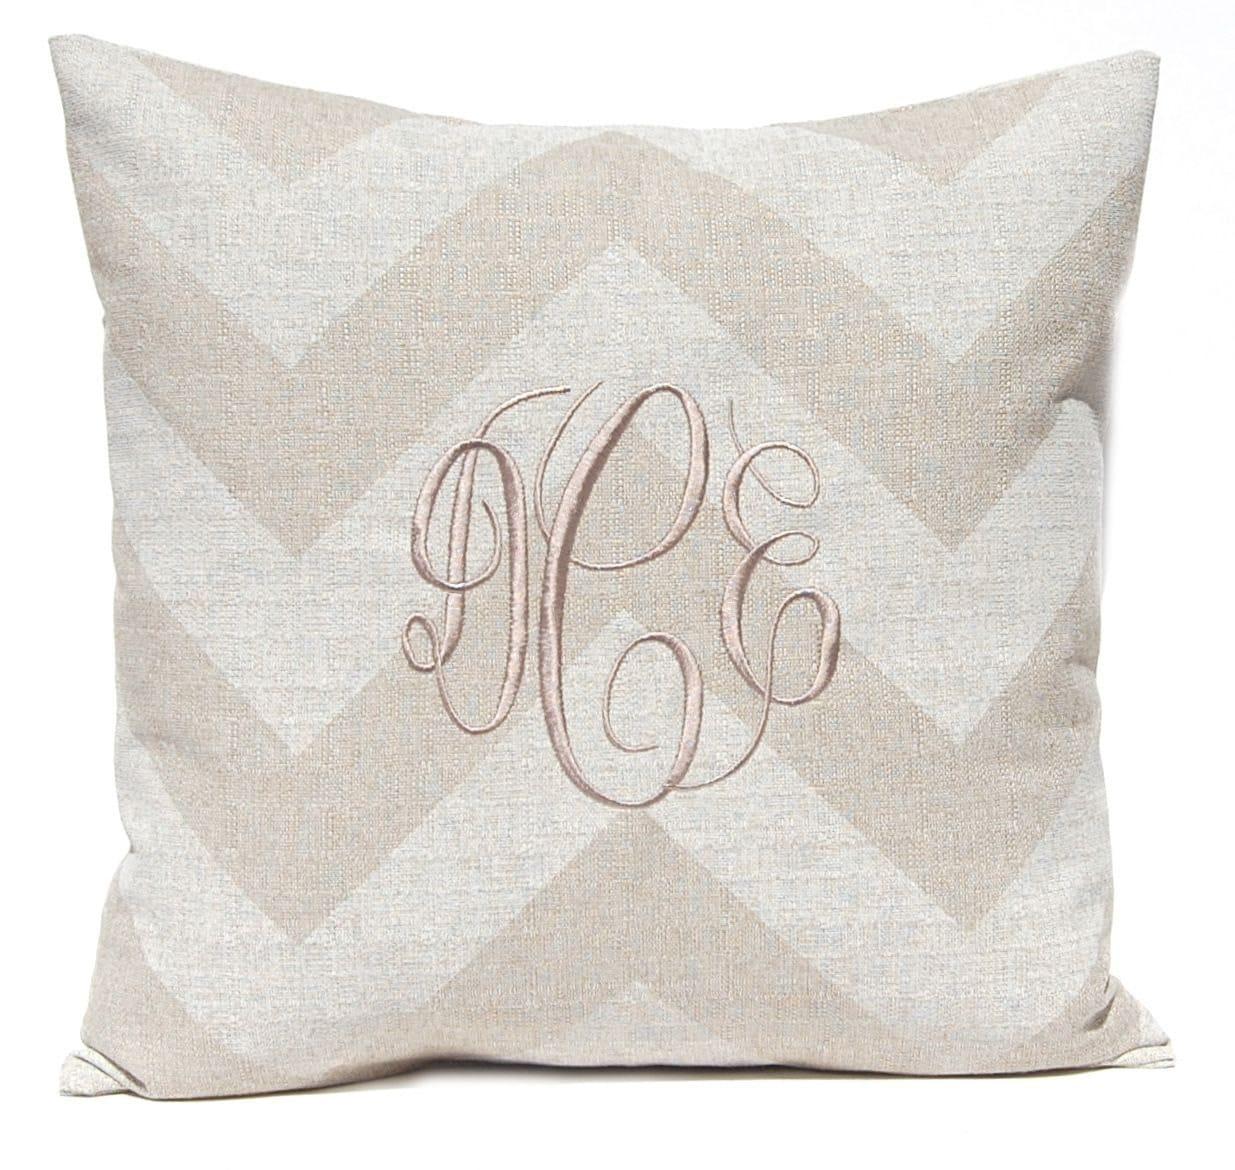 Monogram A Pillow: Monogram Pillow Cover Personalized Pillow Burlap Pillow